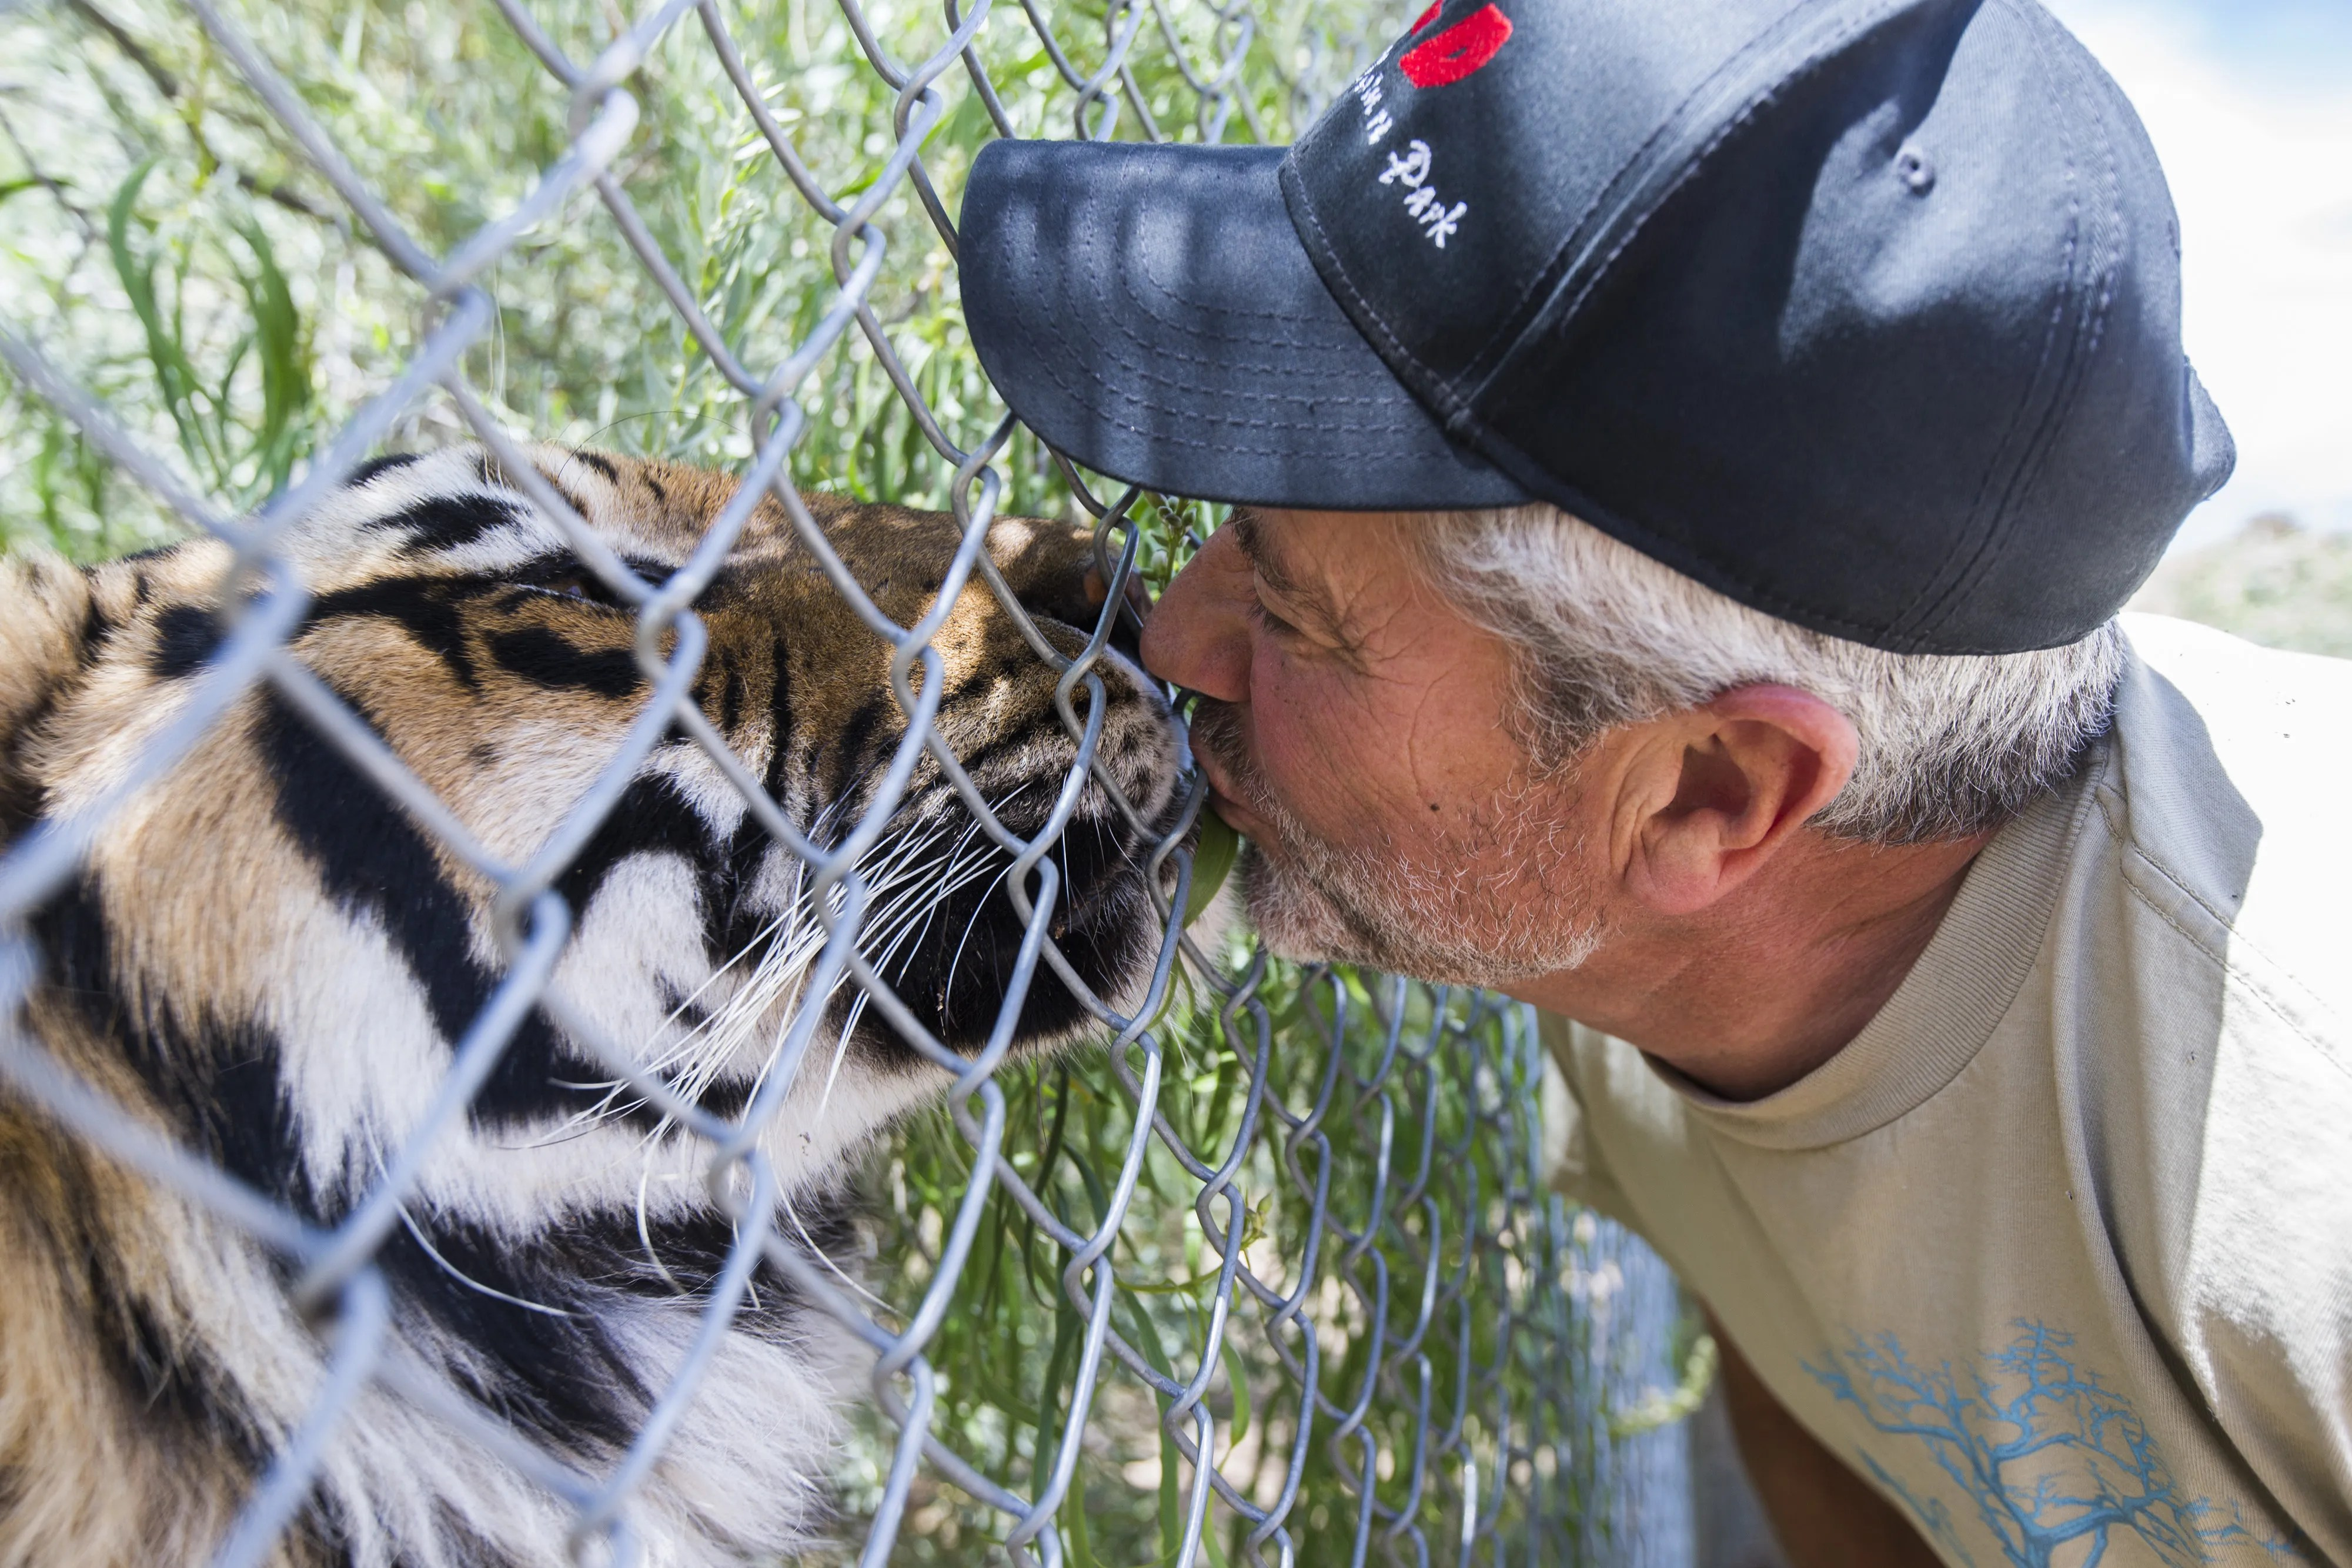 tiger attacks executive director